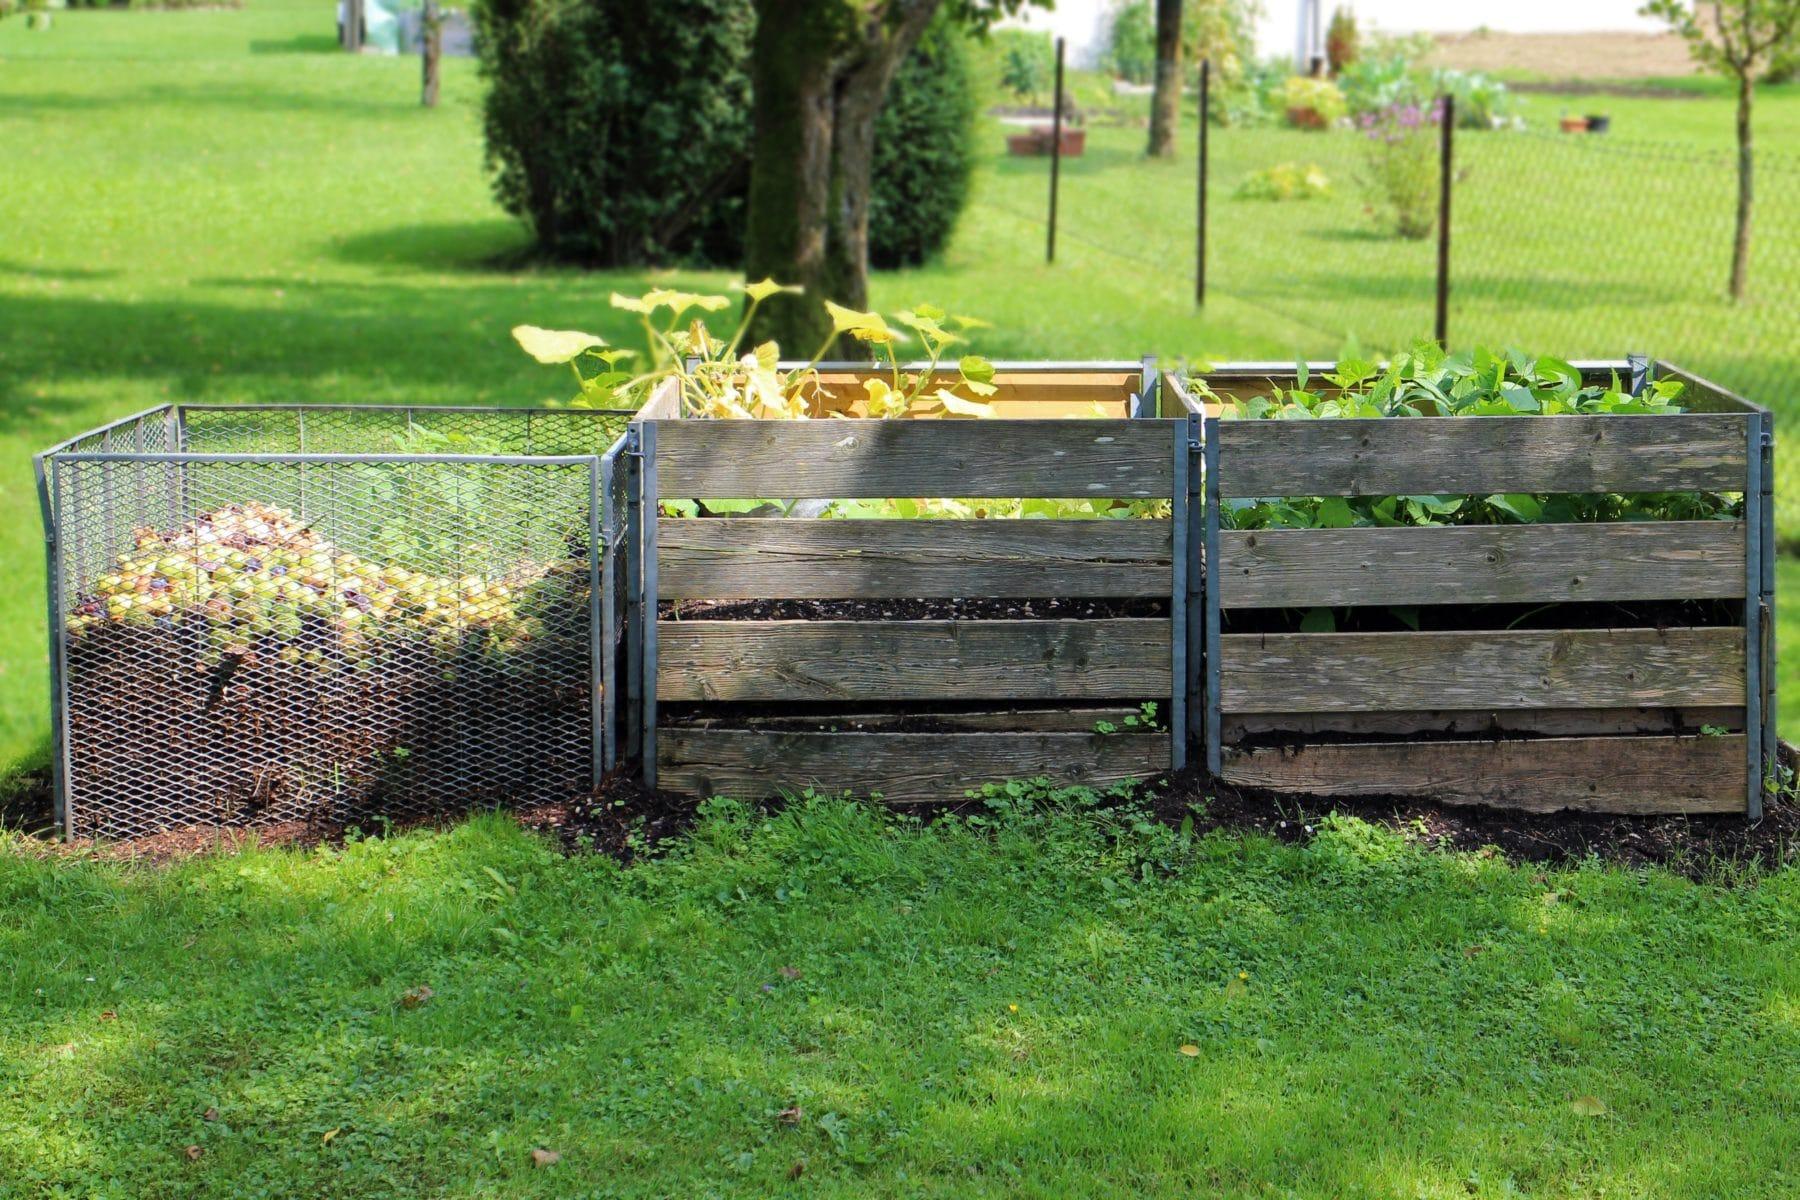 Kompost Anlegen: Mit Dieser Anleitung Gelingt Es! Kompost Anlegen Richtige Pflege Garten